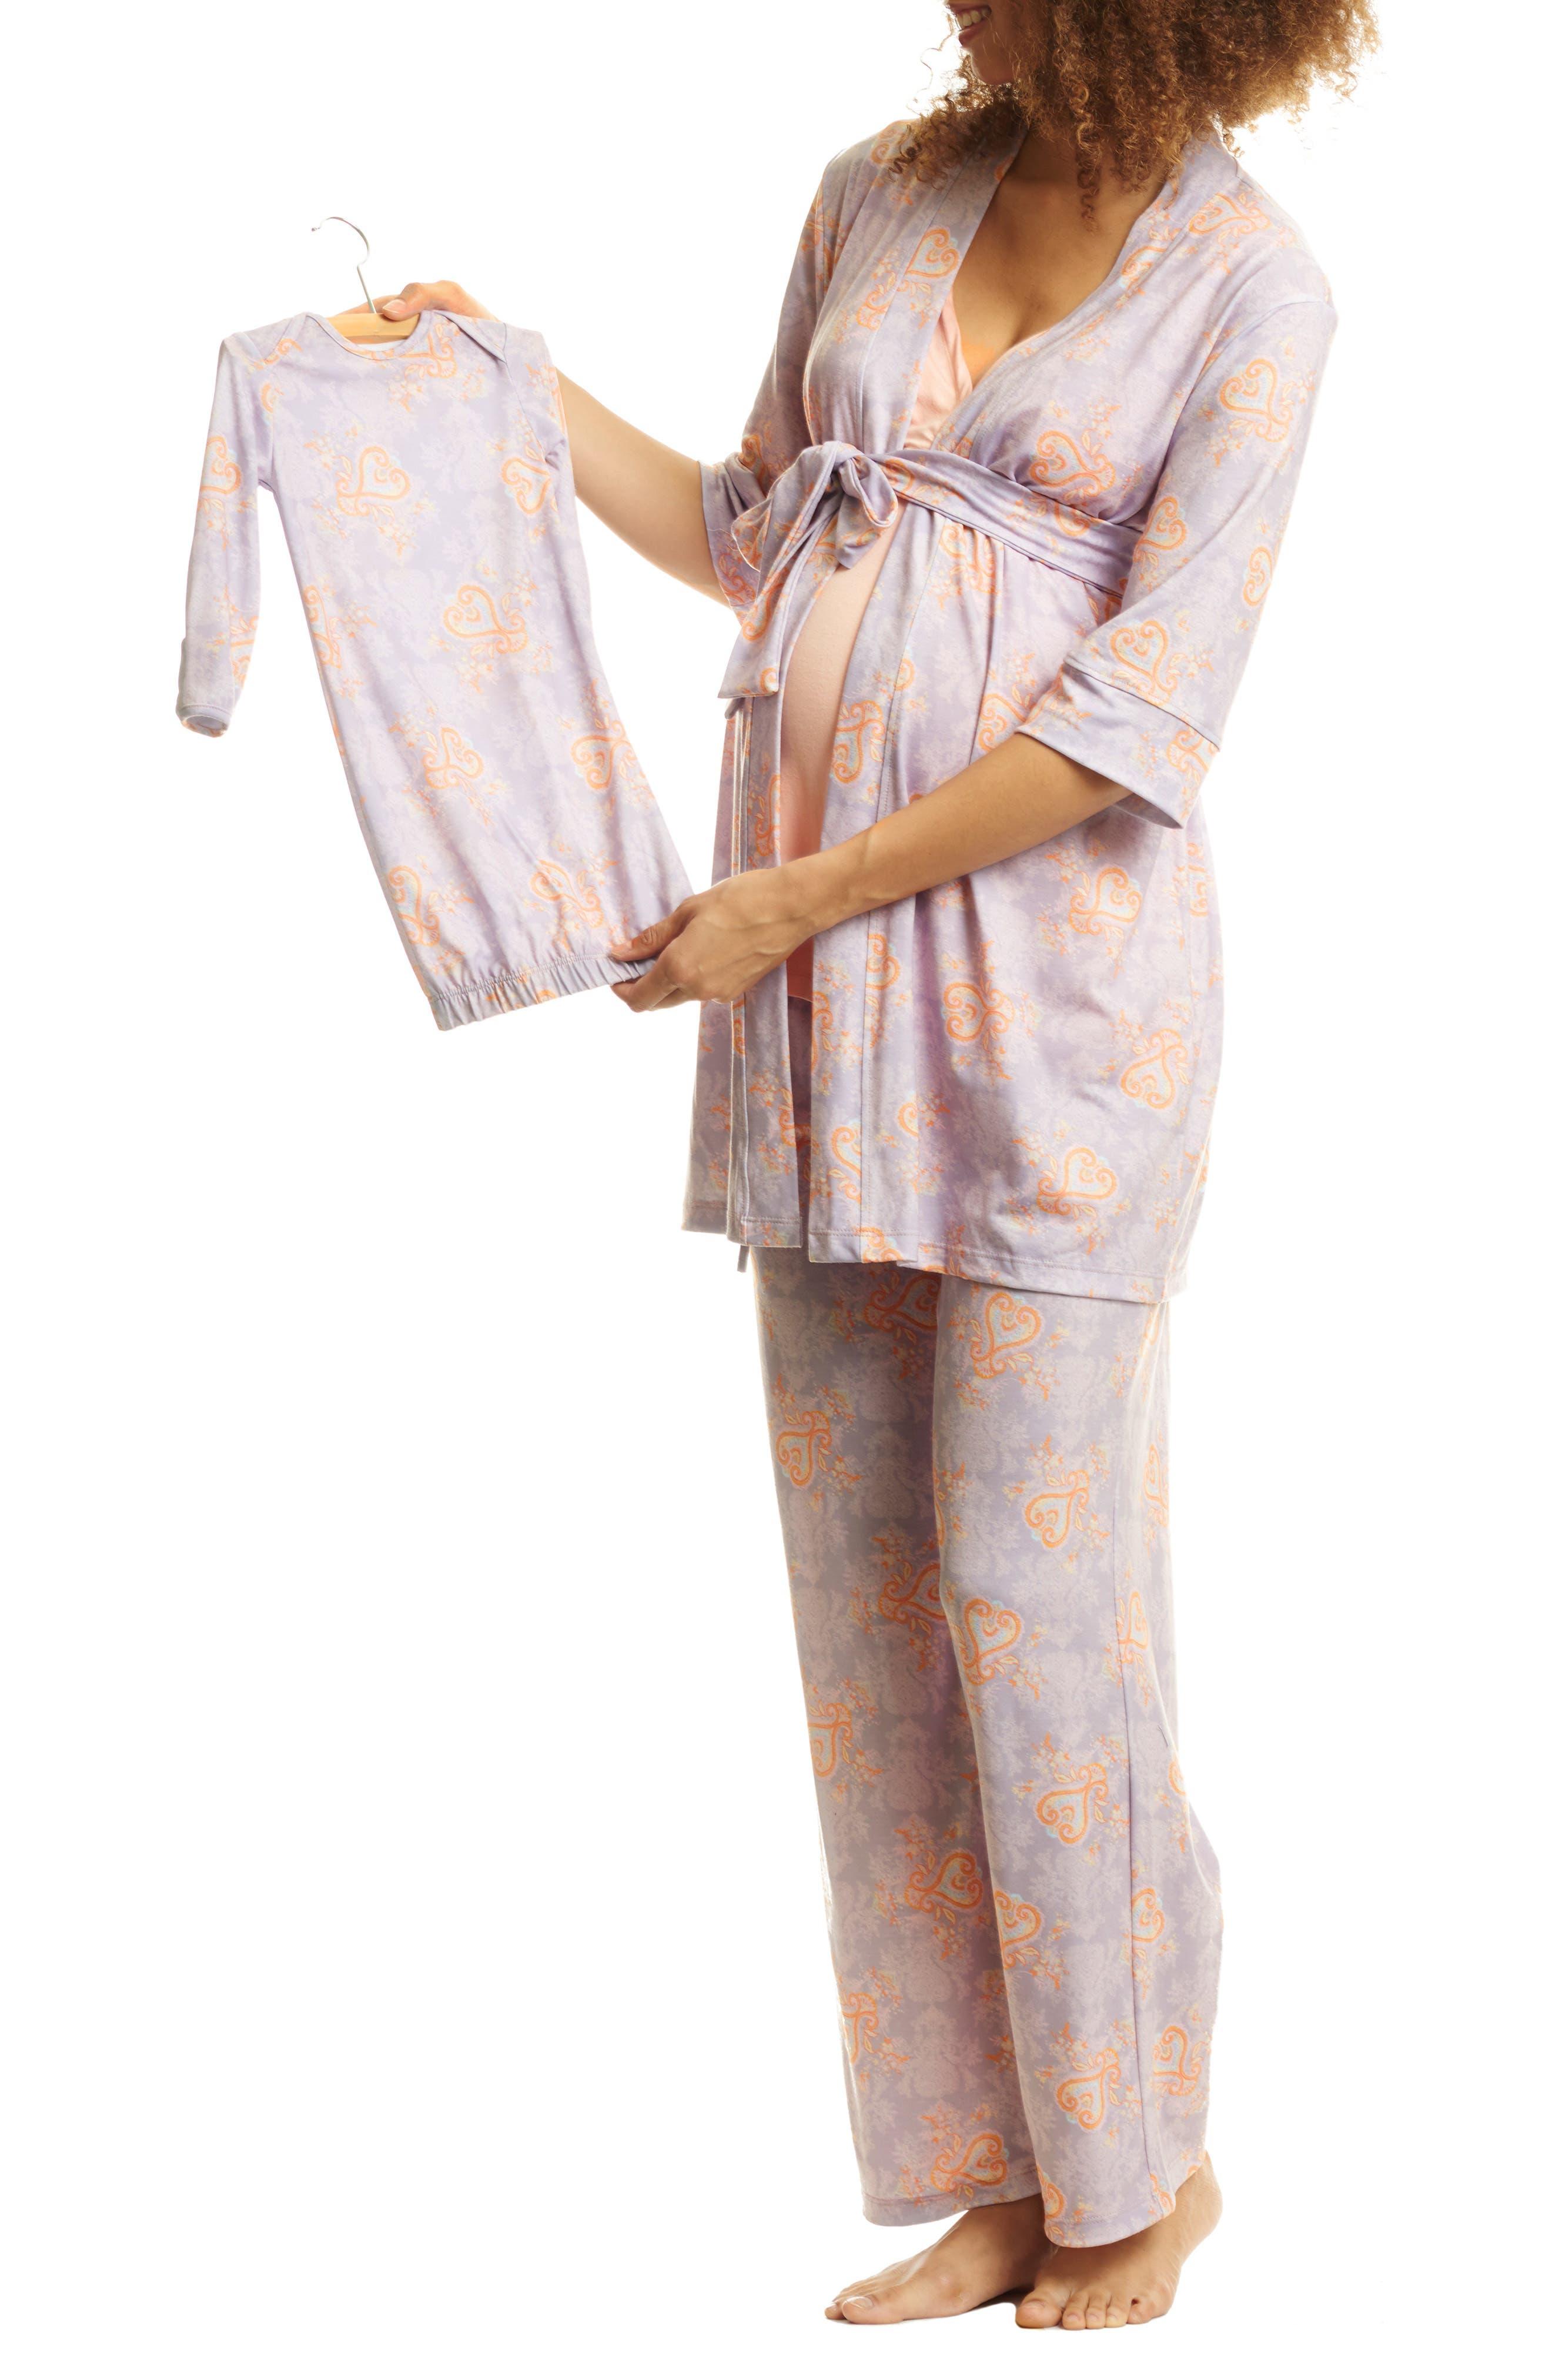 EVERLY GREY, Analise During & After 5-Piece Maternity/Nursing Sleep Set, Main thumbnail 1, color, BOHO